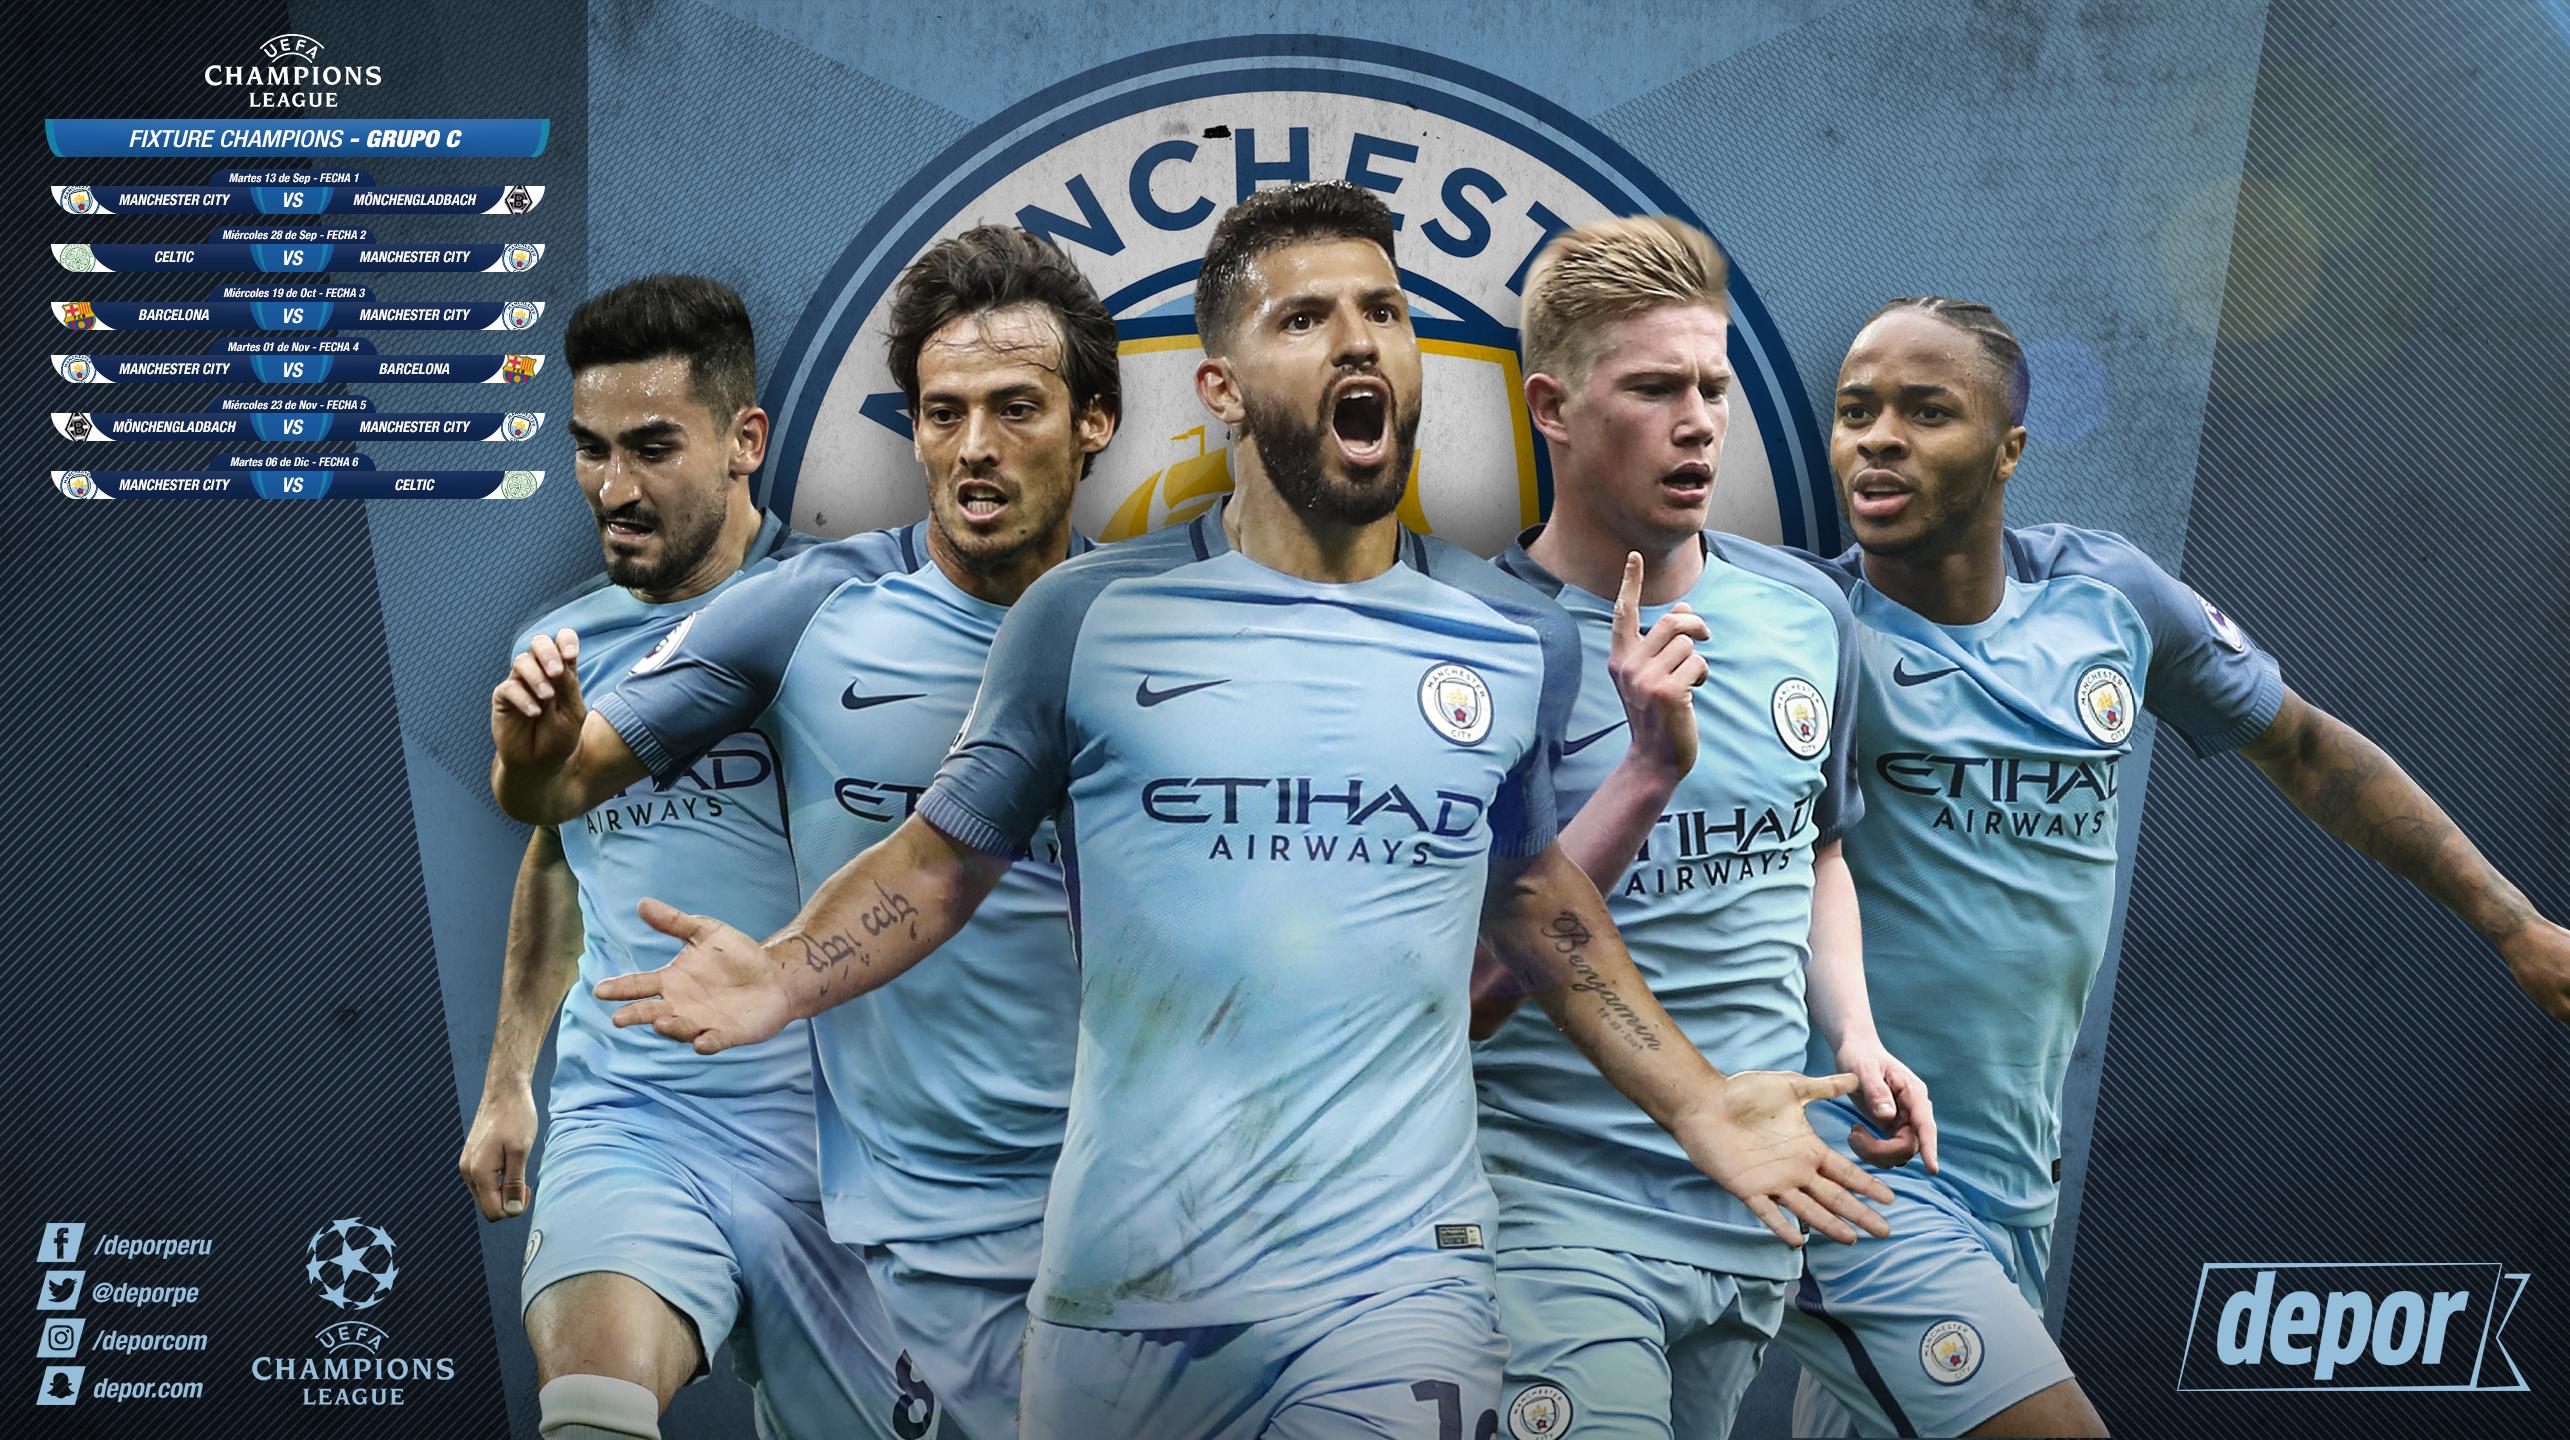 Champions League Hoy Descarga Gratis El Wallpaper Del